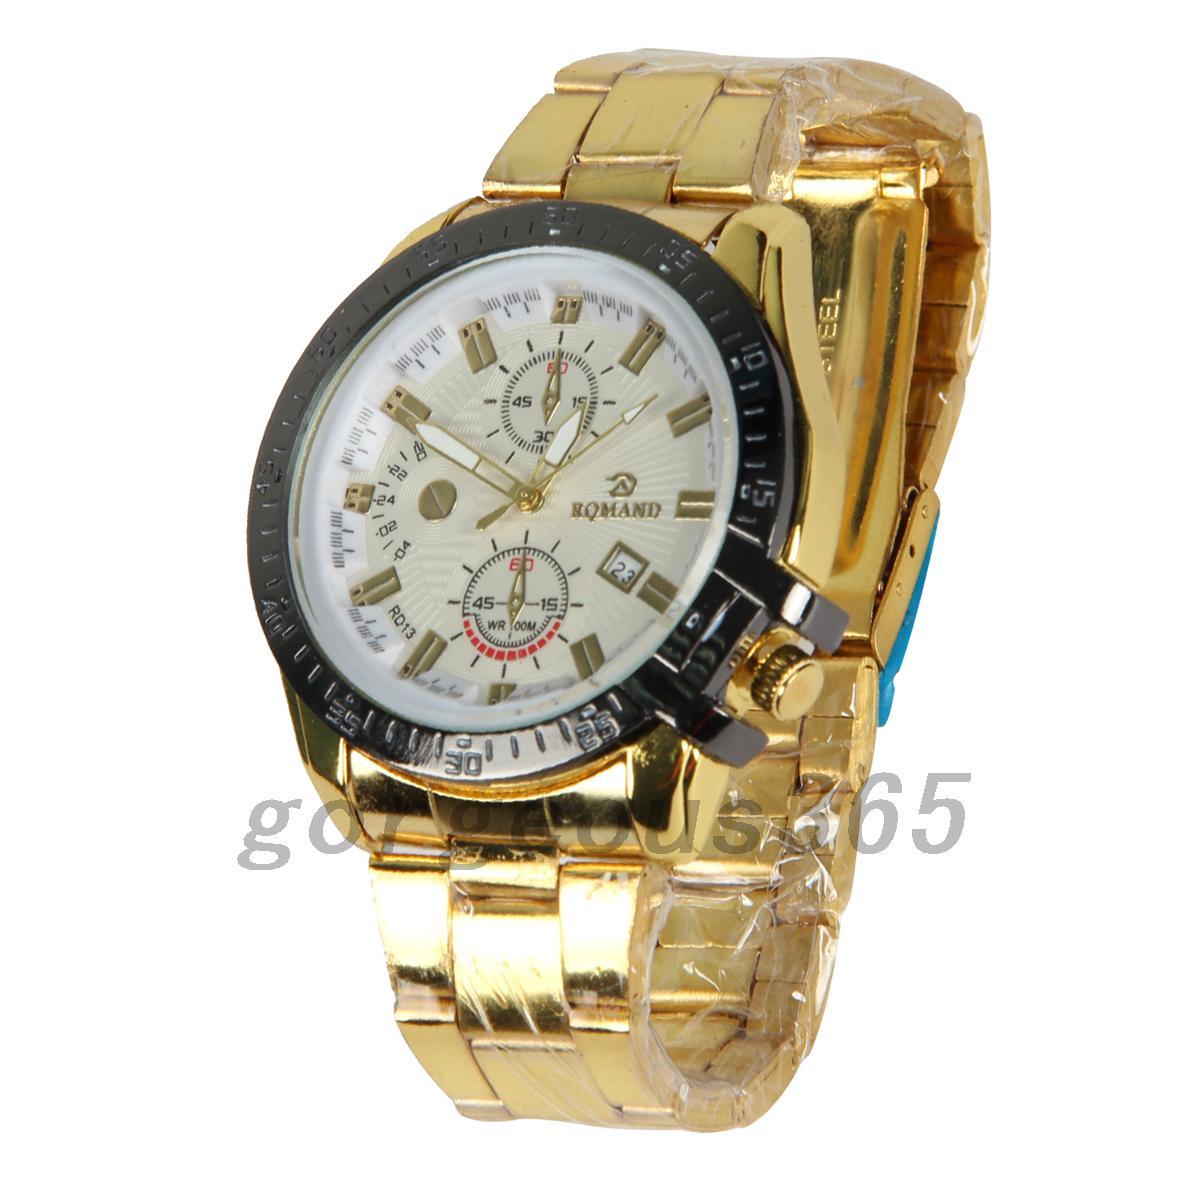 1pcs-Fashion-Men-039-s-Stainless-Steel-Belt-Sport-Business-Quartz-Watch-Wristwatche